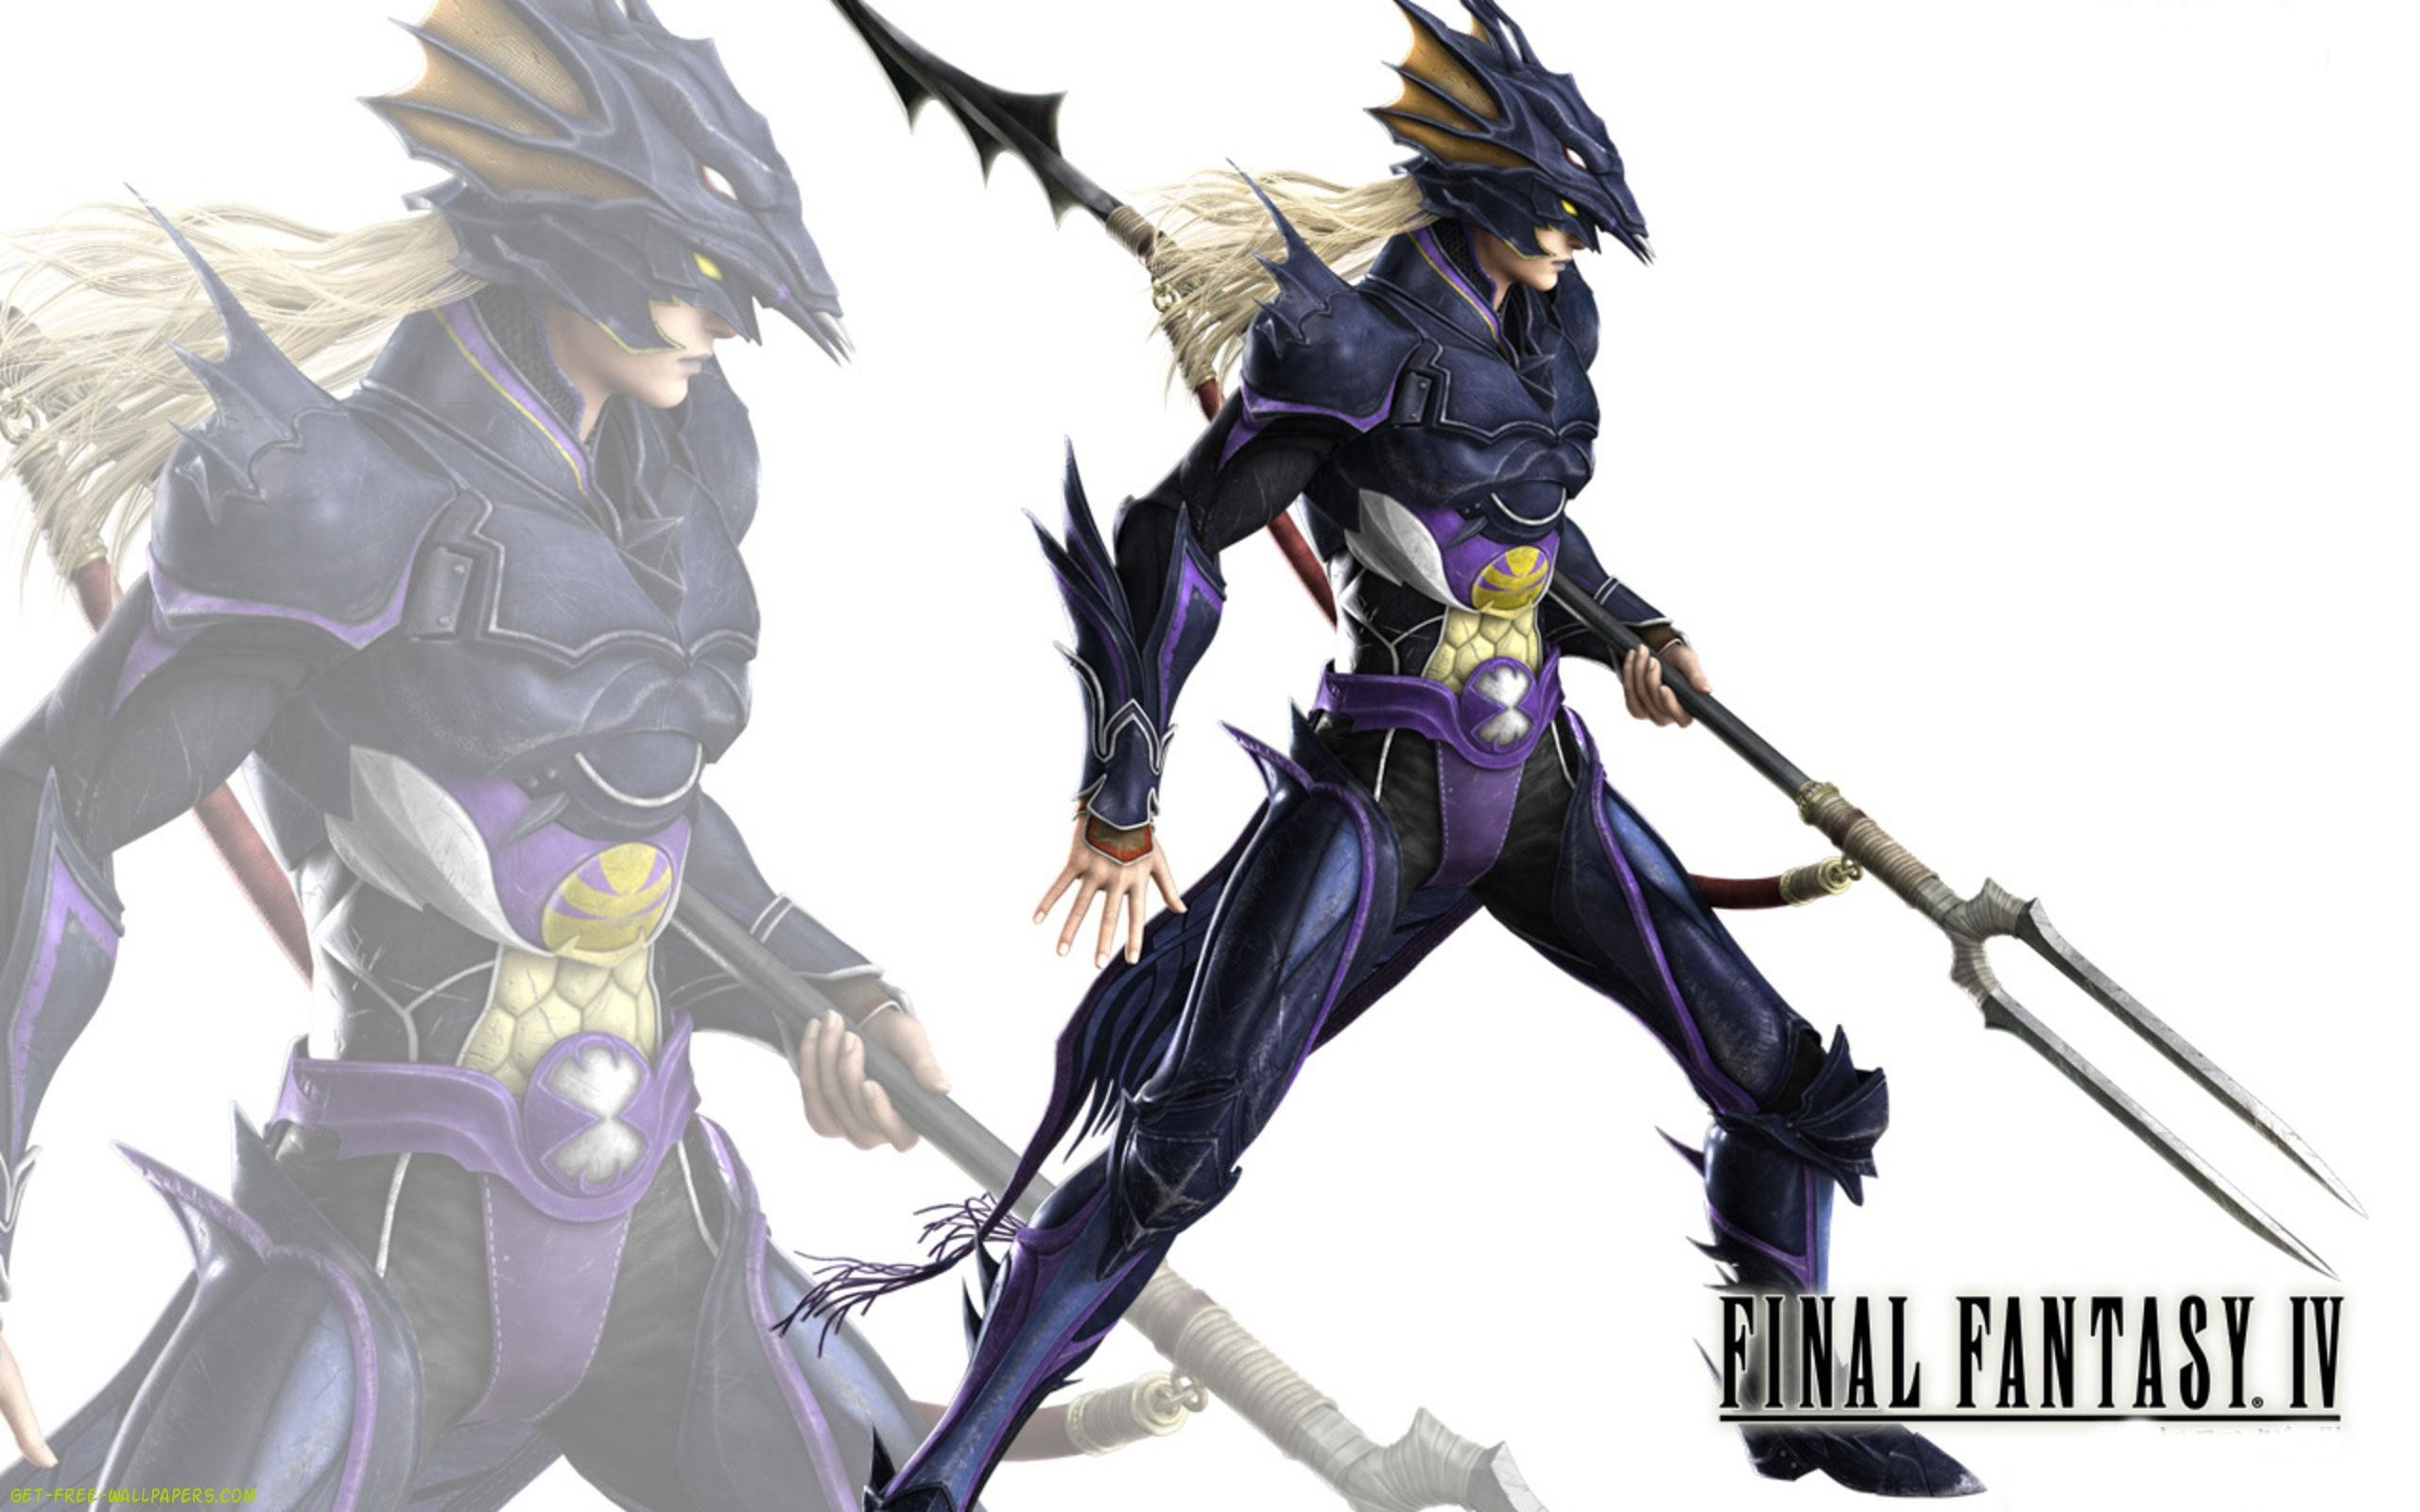 Download Final Fantasy IV Wallpaper